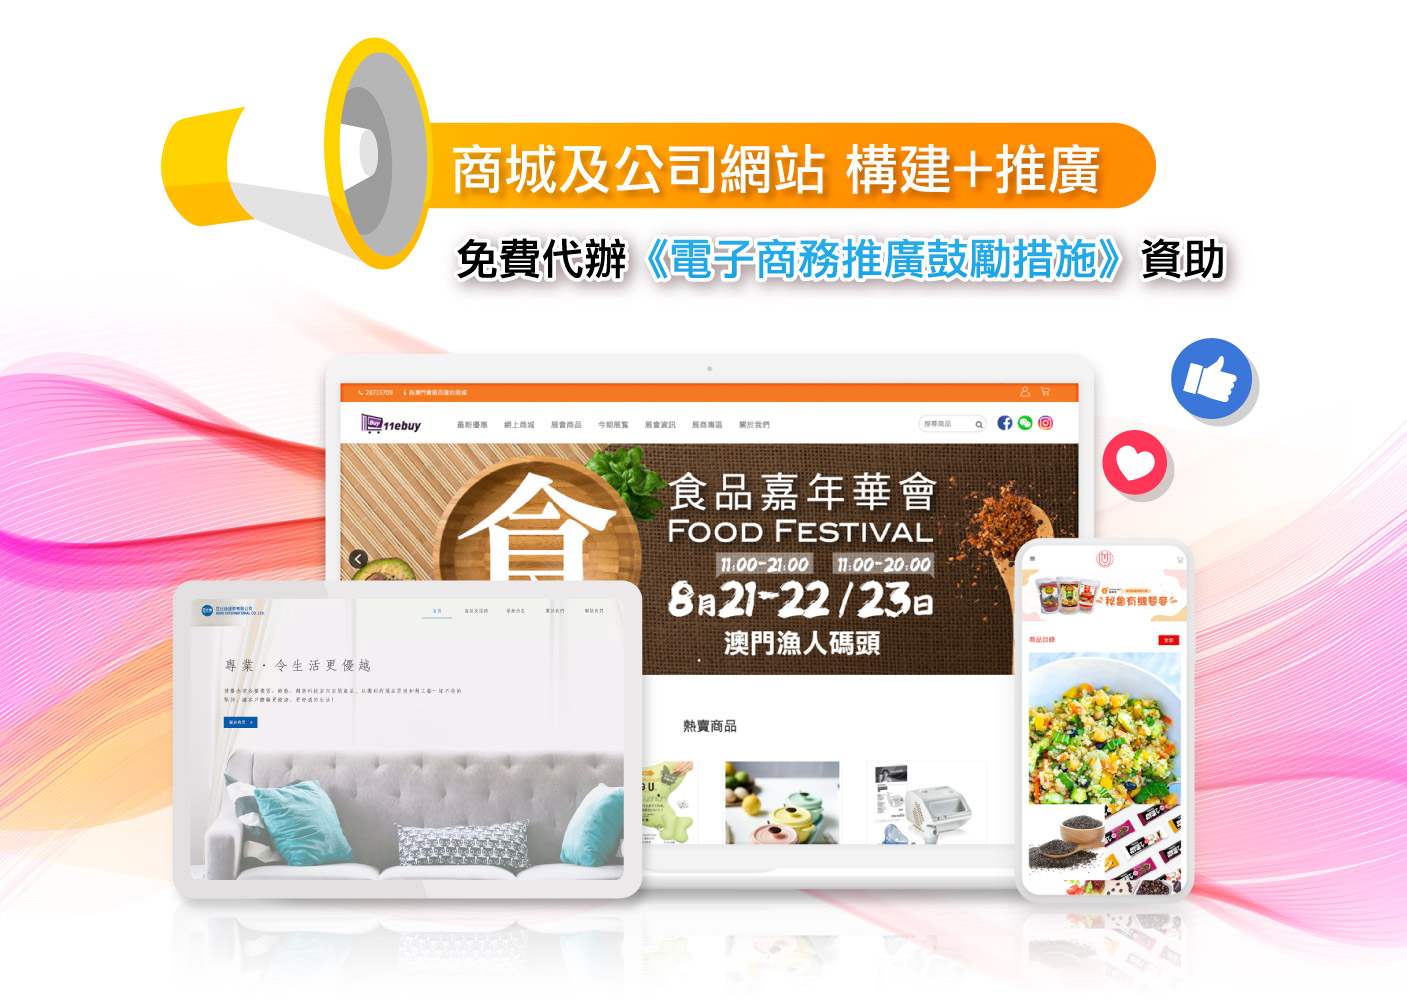 IPIM_電子商務推廣資助_澳門黃頁S2